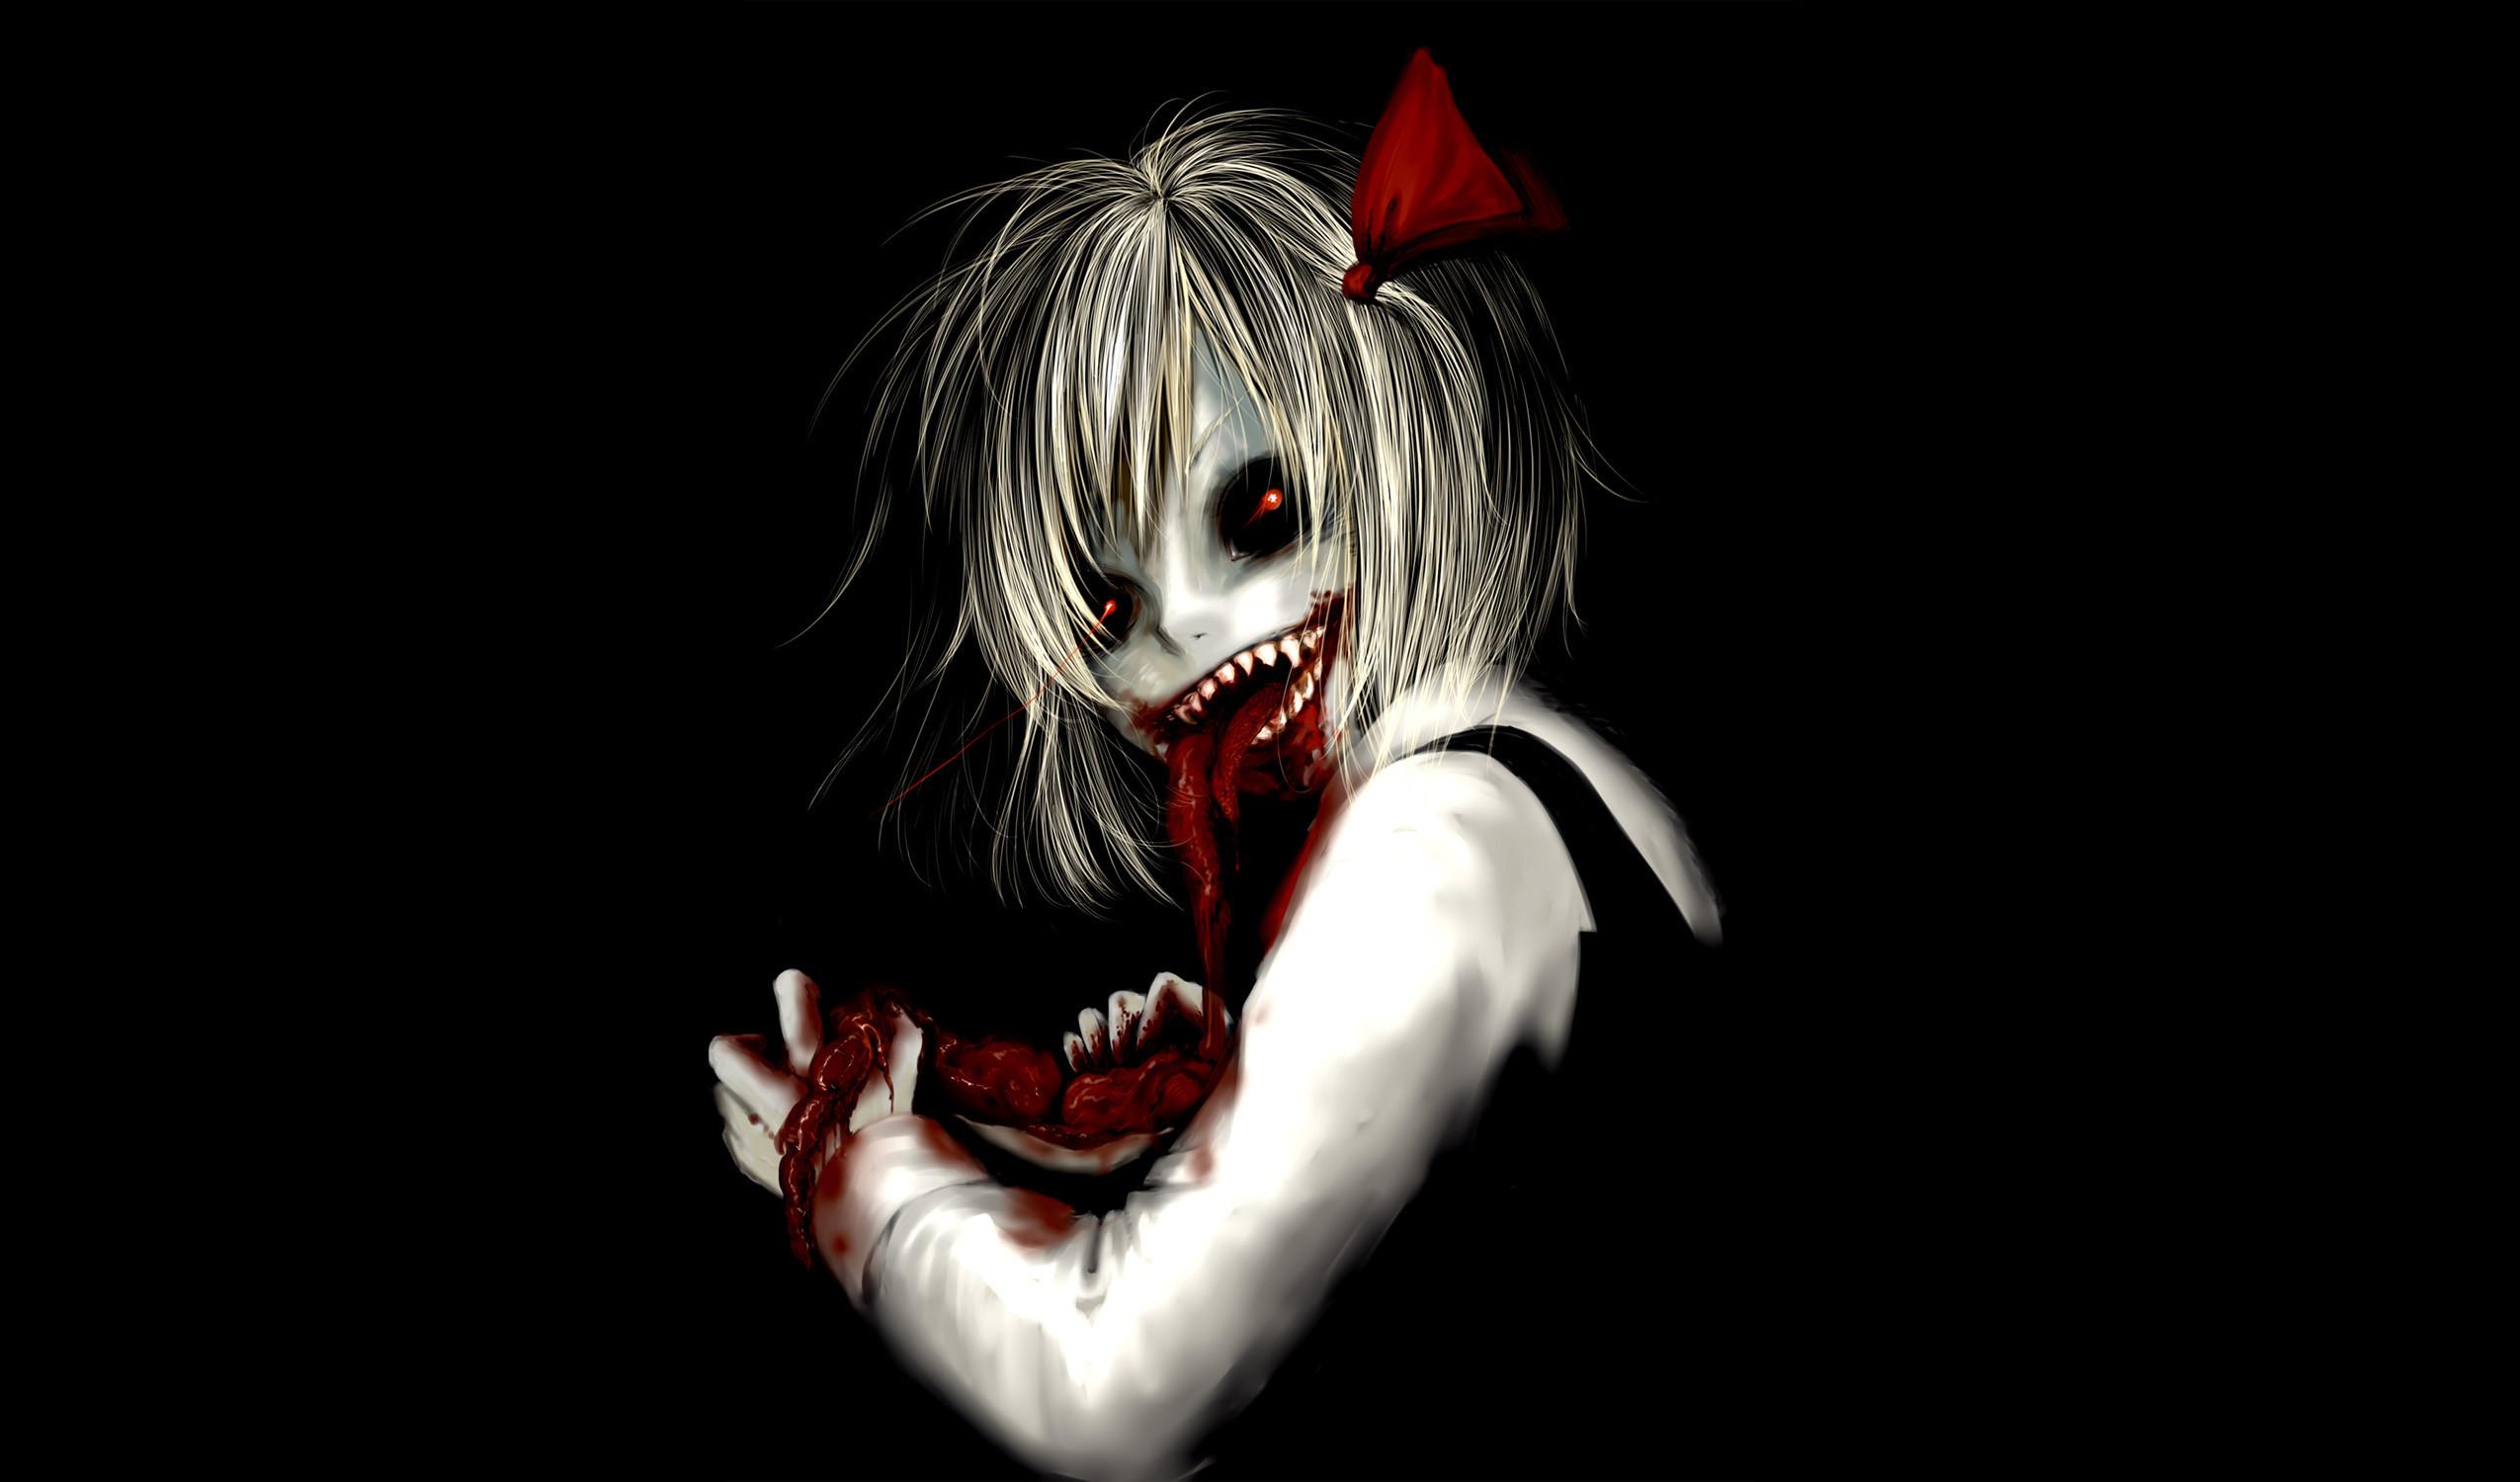 creepy halloween wallpaper 16